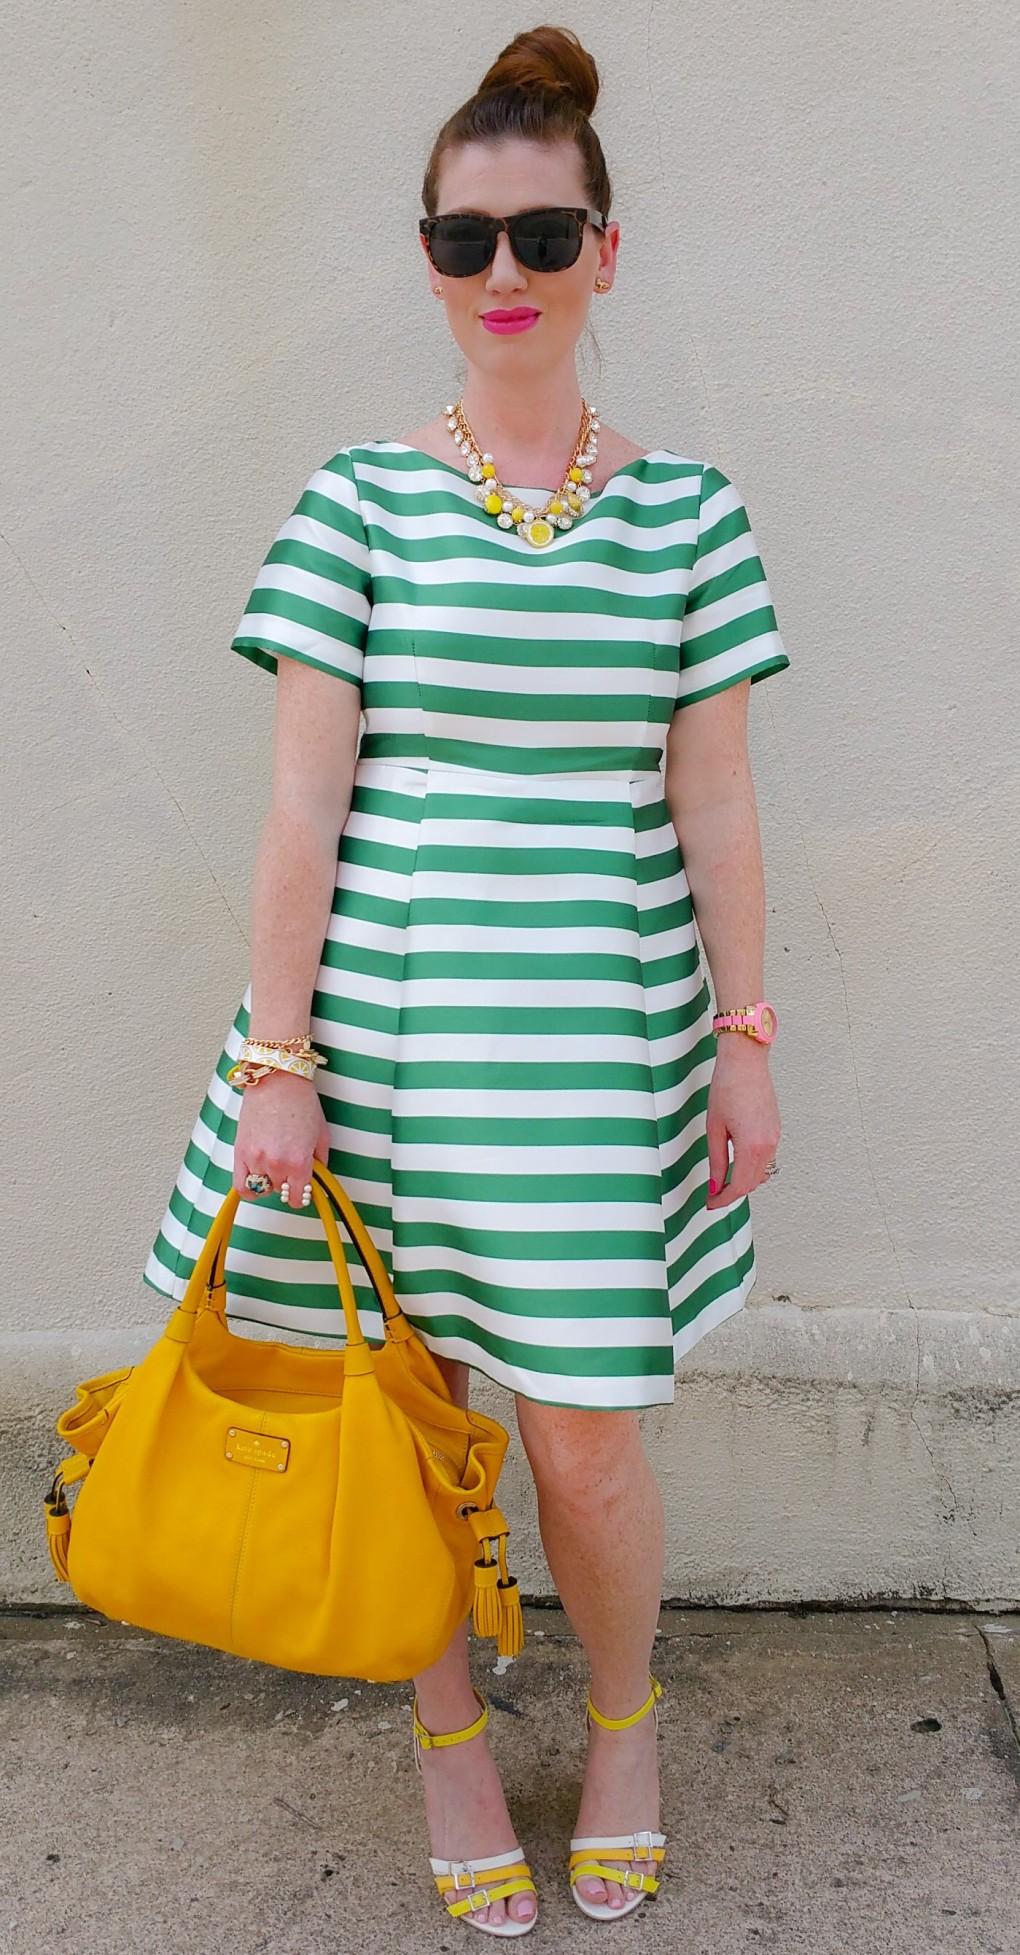 Dress: Kate Spade NY Bag: Kate Spade NY Wedges: ShoeDazzle Madison Jewelry: Charming Charlie